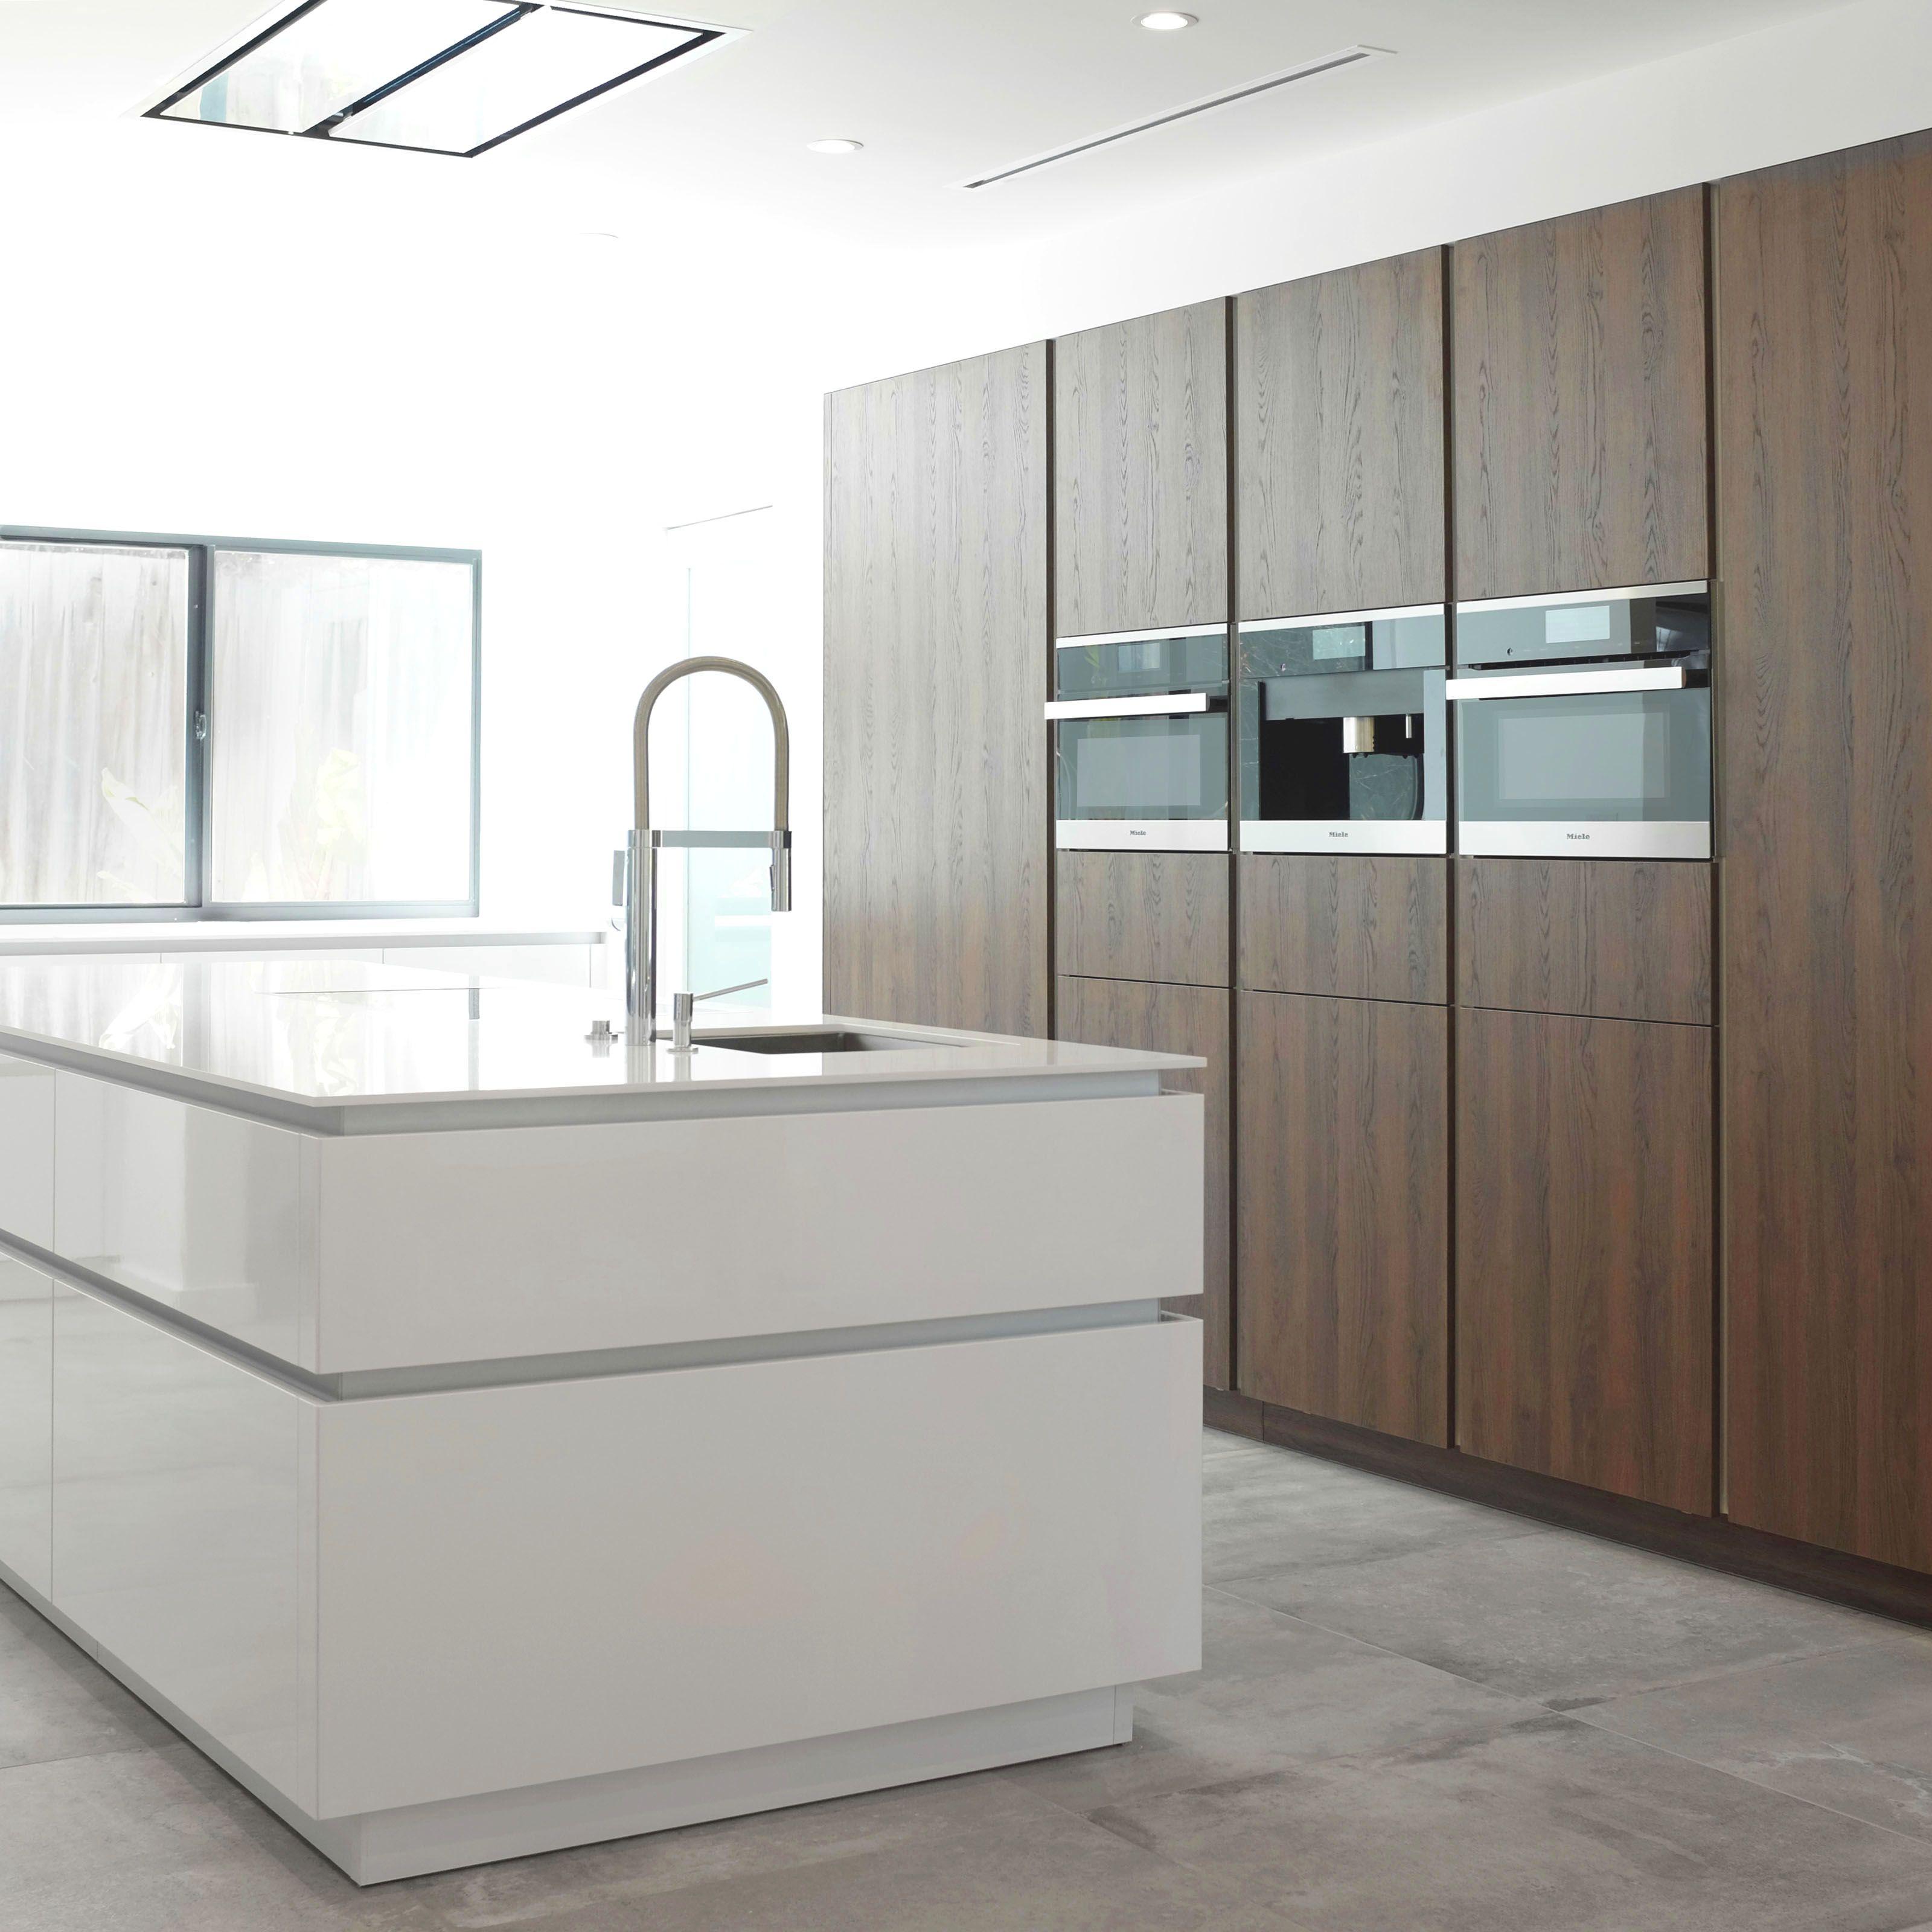 Wildhagen strakke moderne keuken met houten kasten wand en greeploos kookeiland - Moderne designkeuken ...